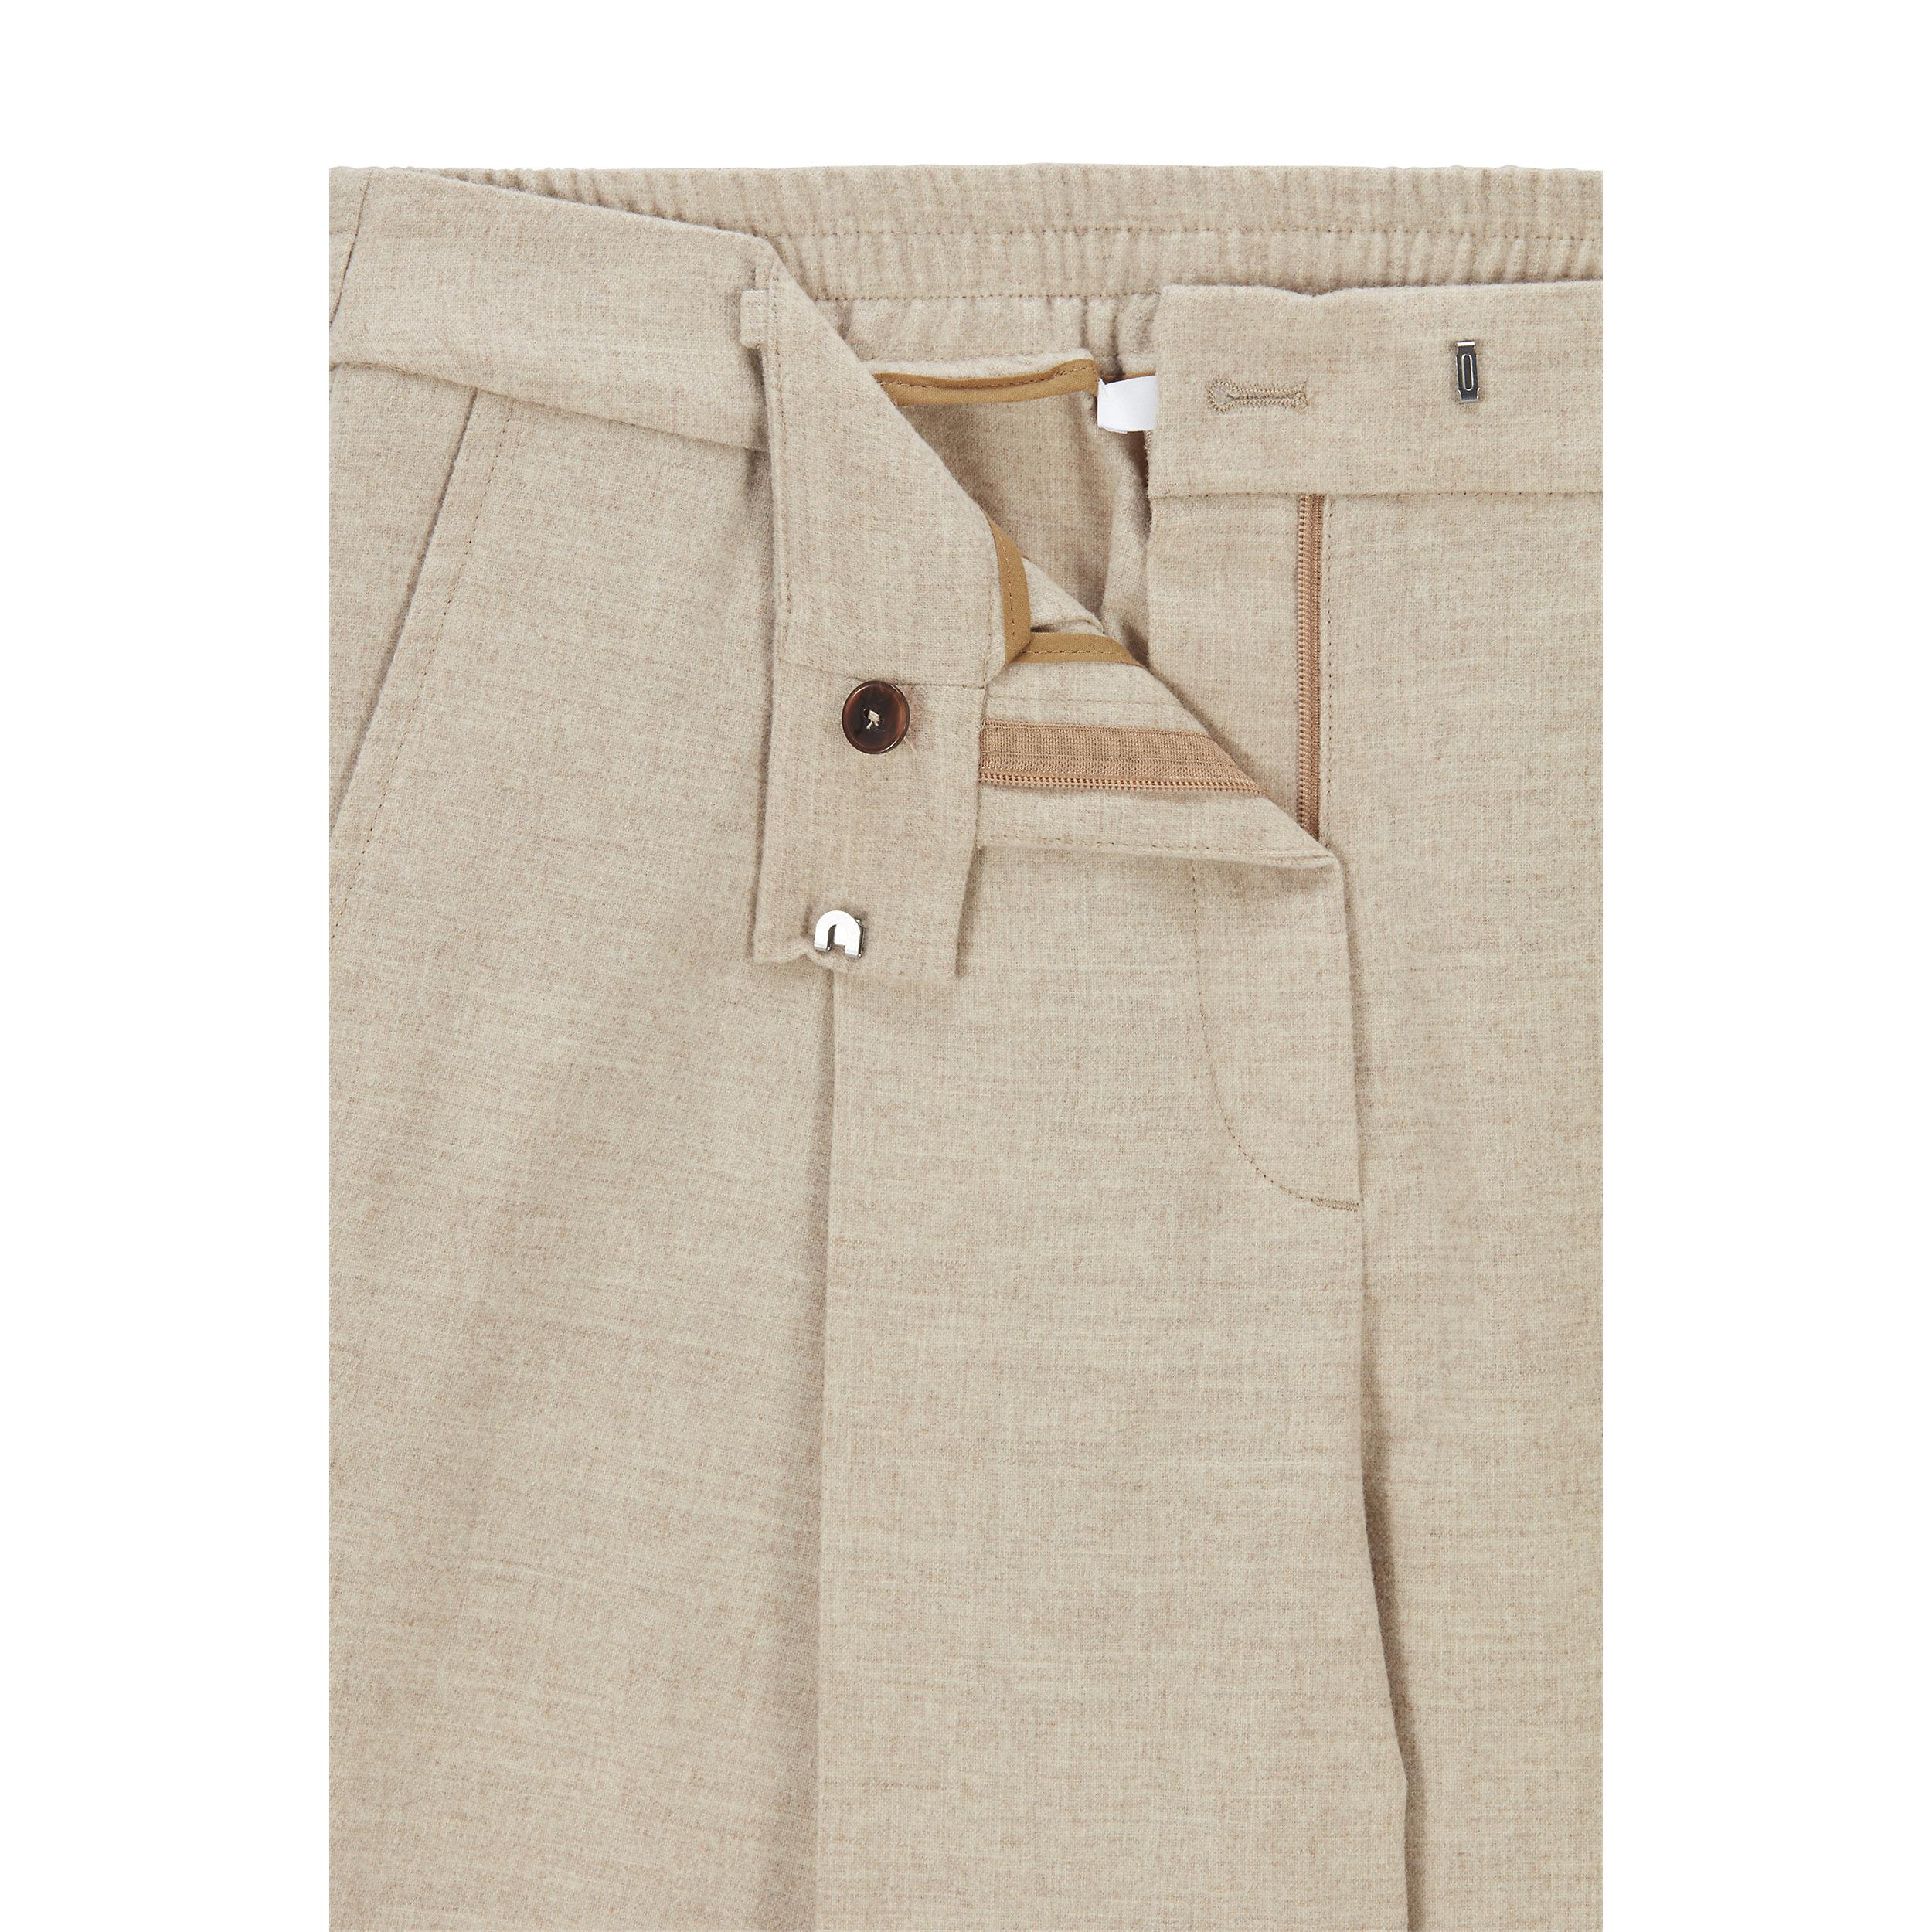 Pantalone baggy a vita alta in lana beige chiaro BOSS   Pantaloni   50458592235